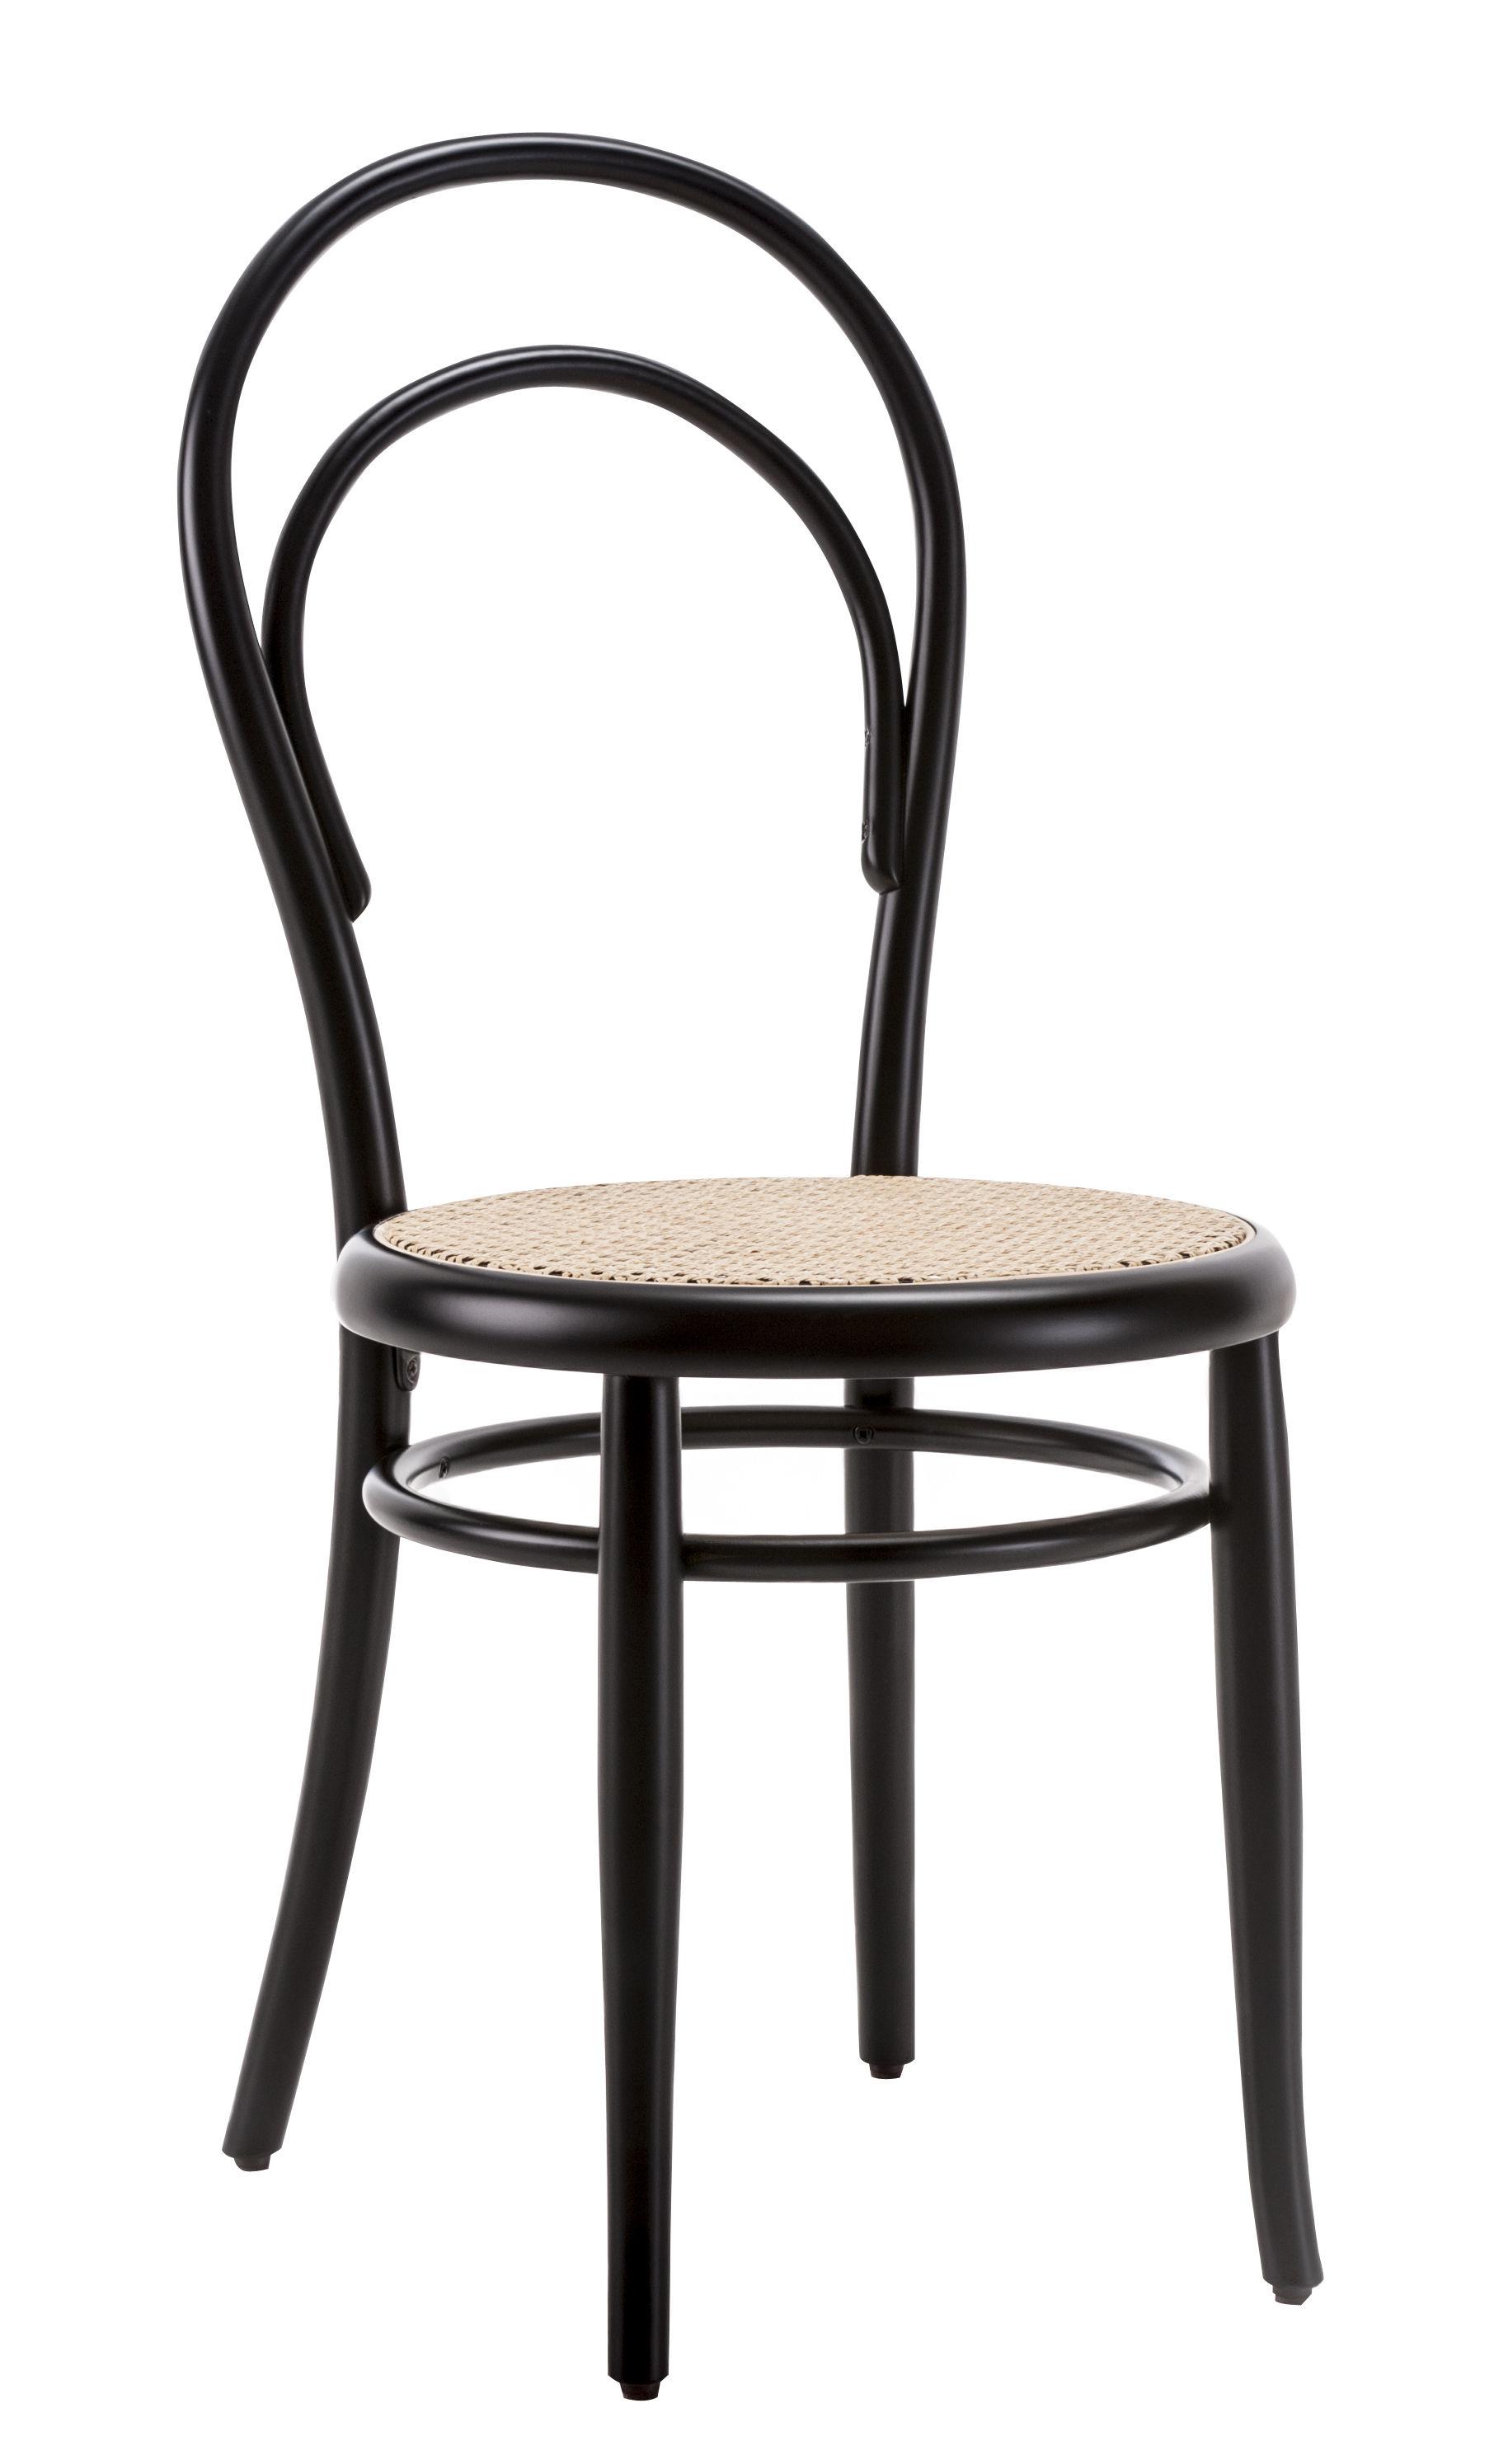 Sedie A Legno Curvo E Impagliate.Sedia N 14 Wiener Gtv Design Seduta Paglia Nero Made In Design